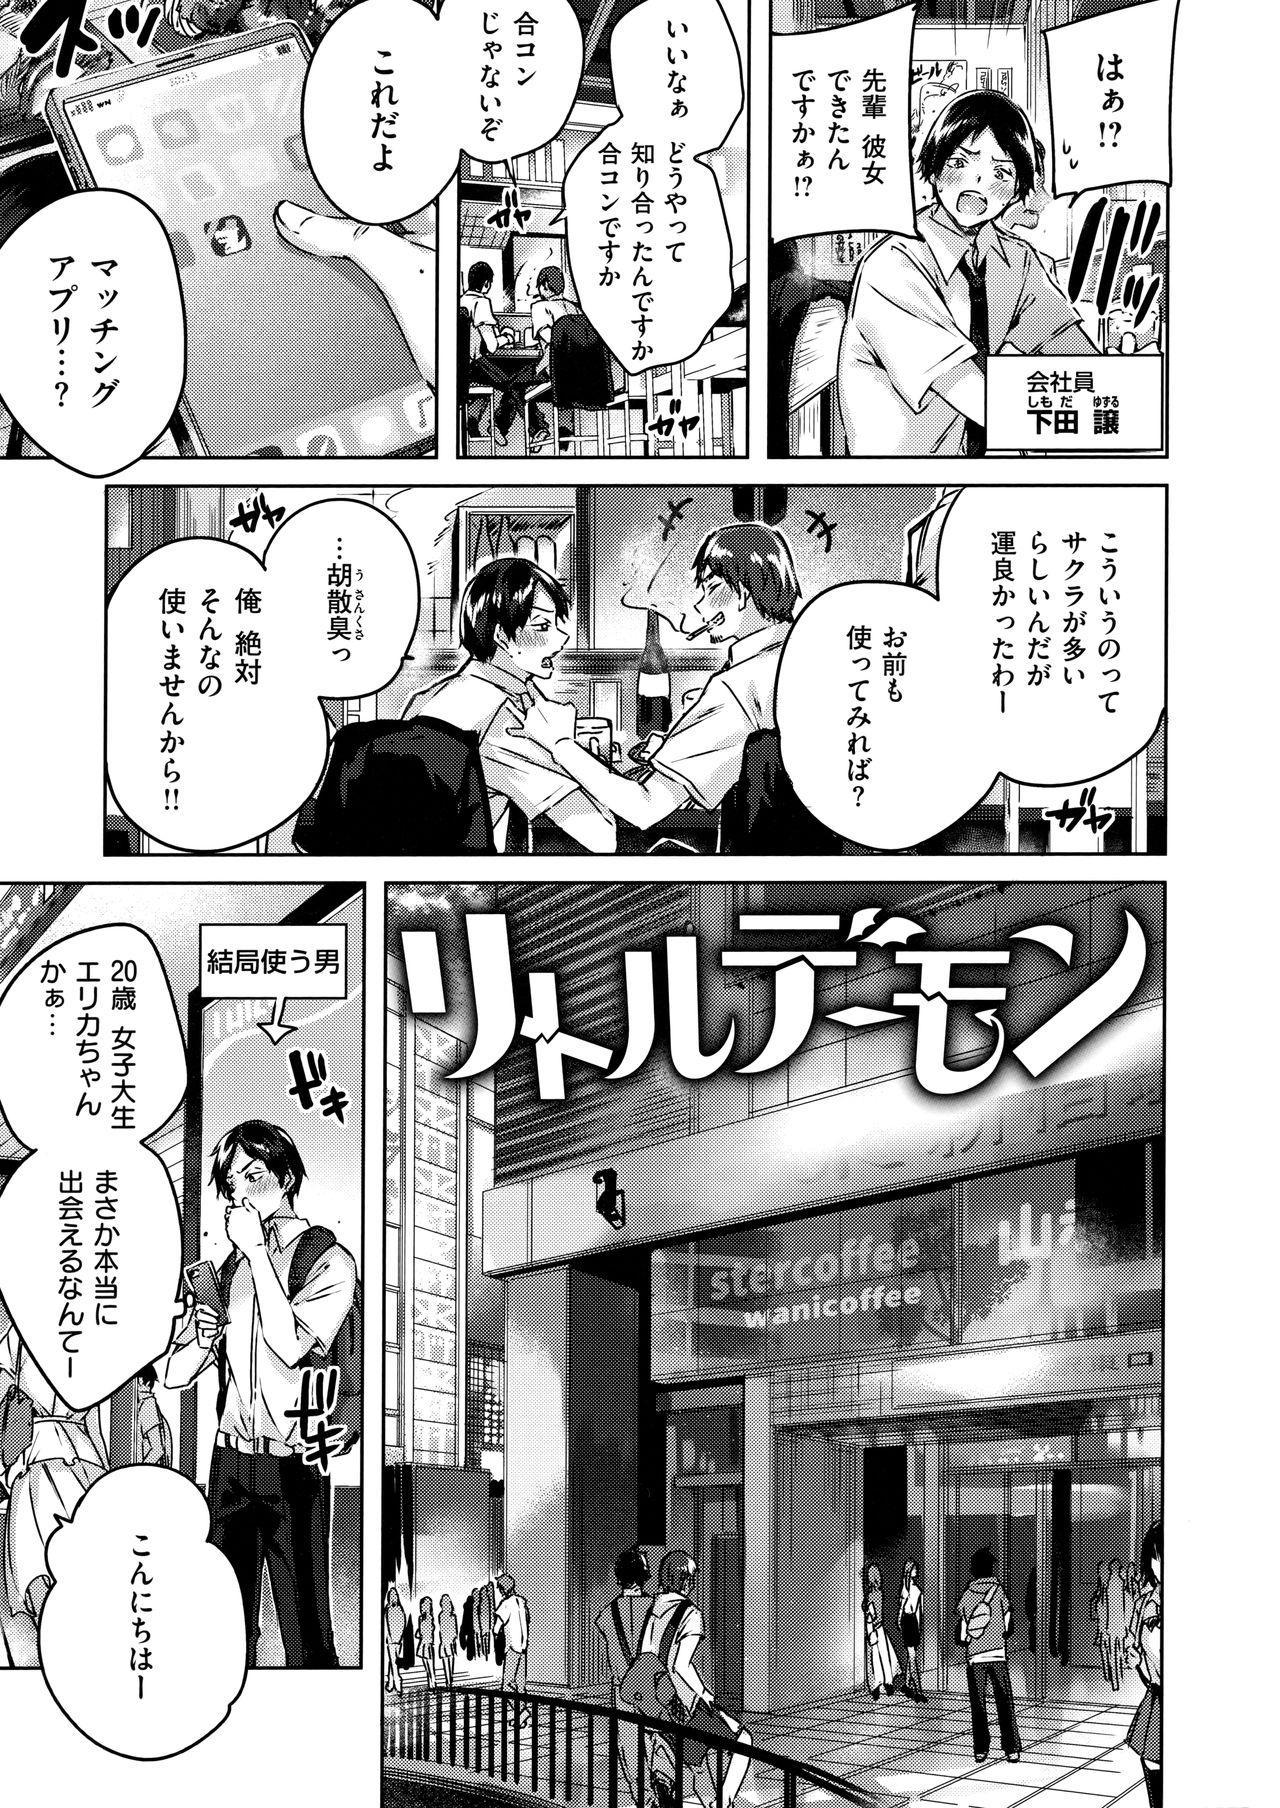 Nakadashi Strike! - Winning strike! 46